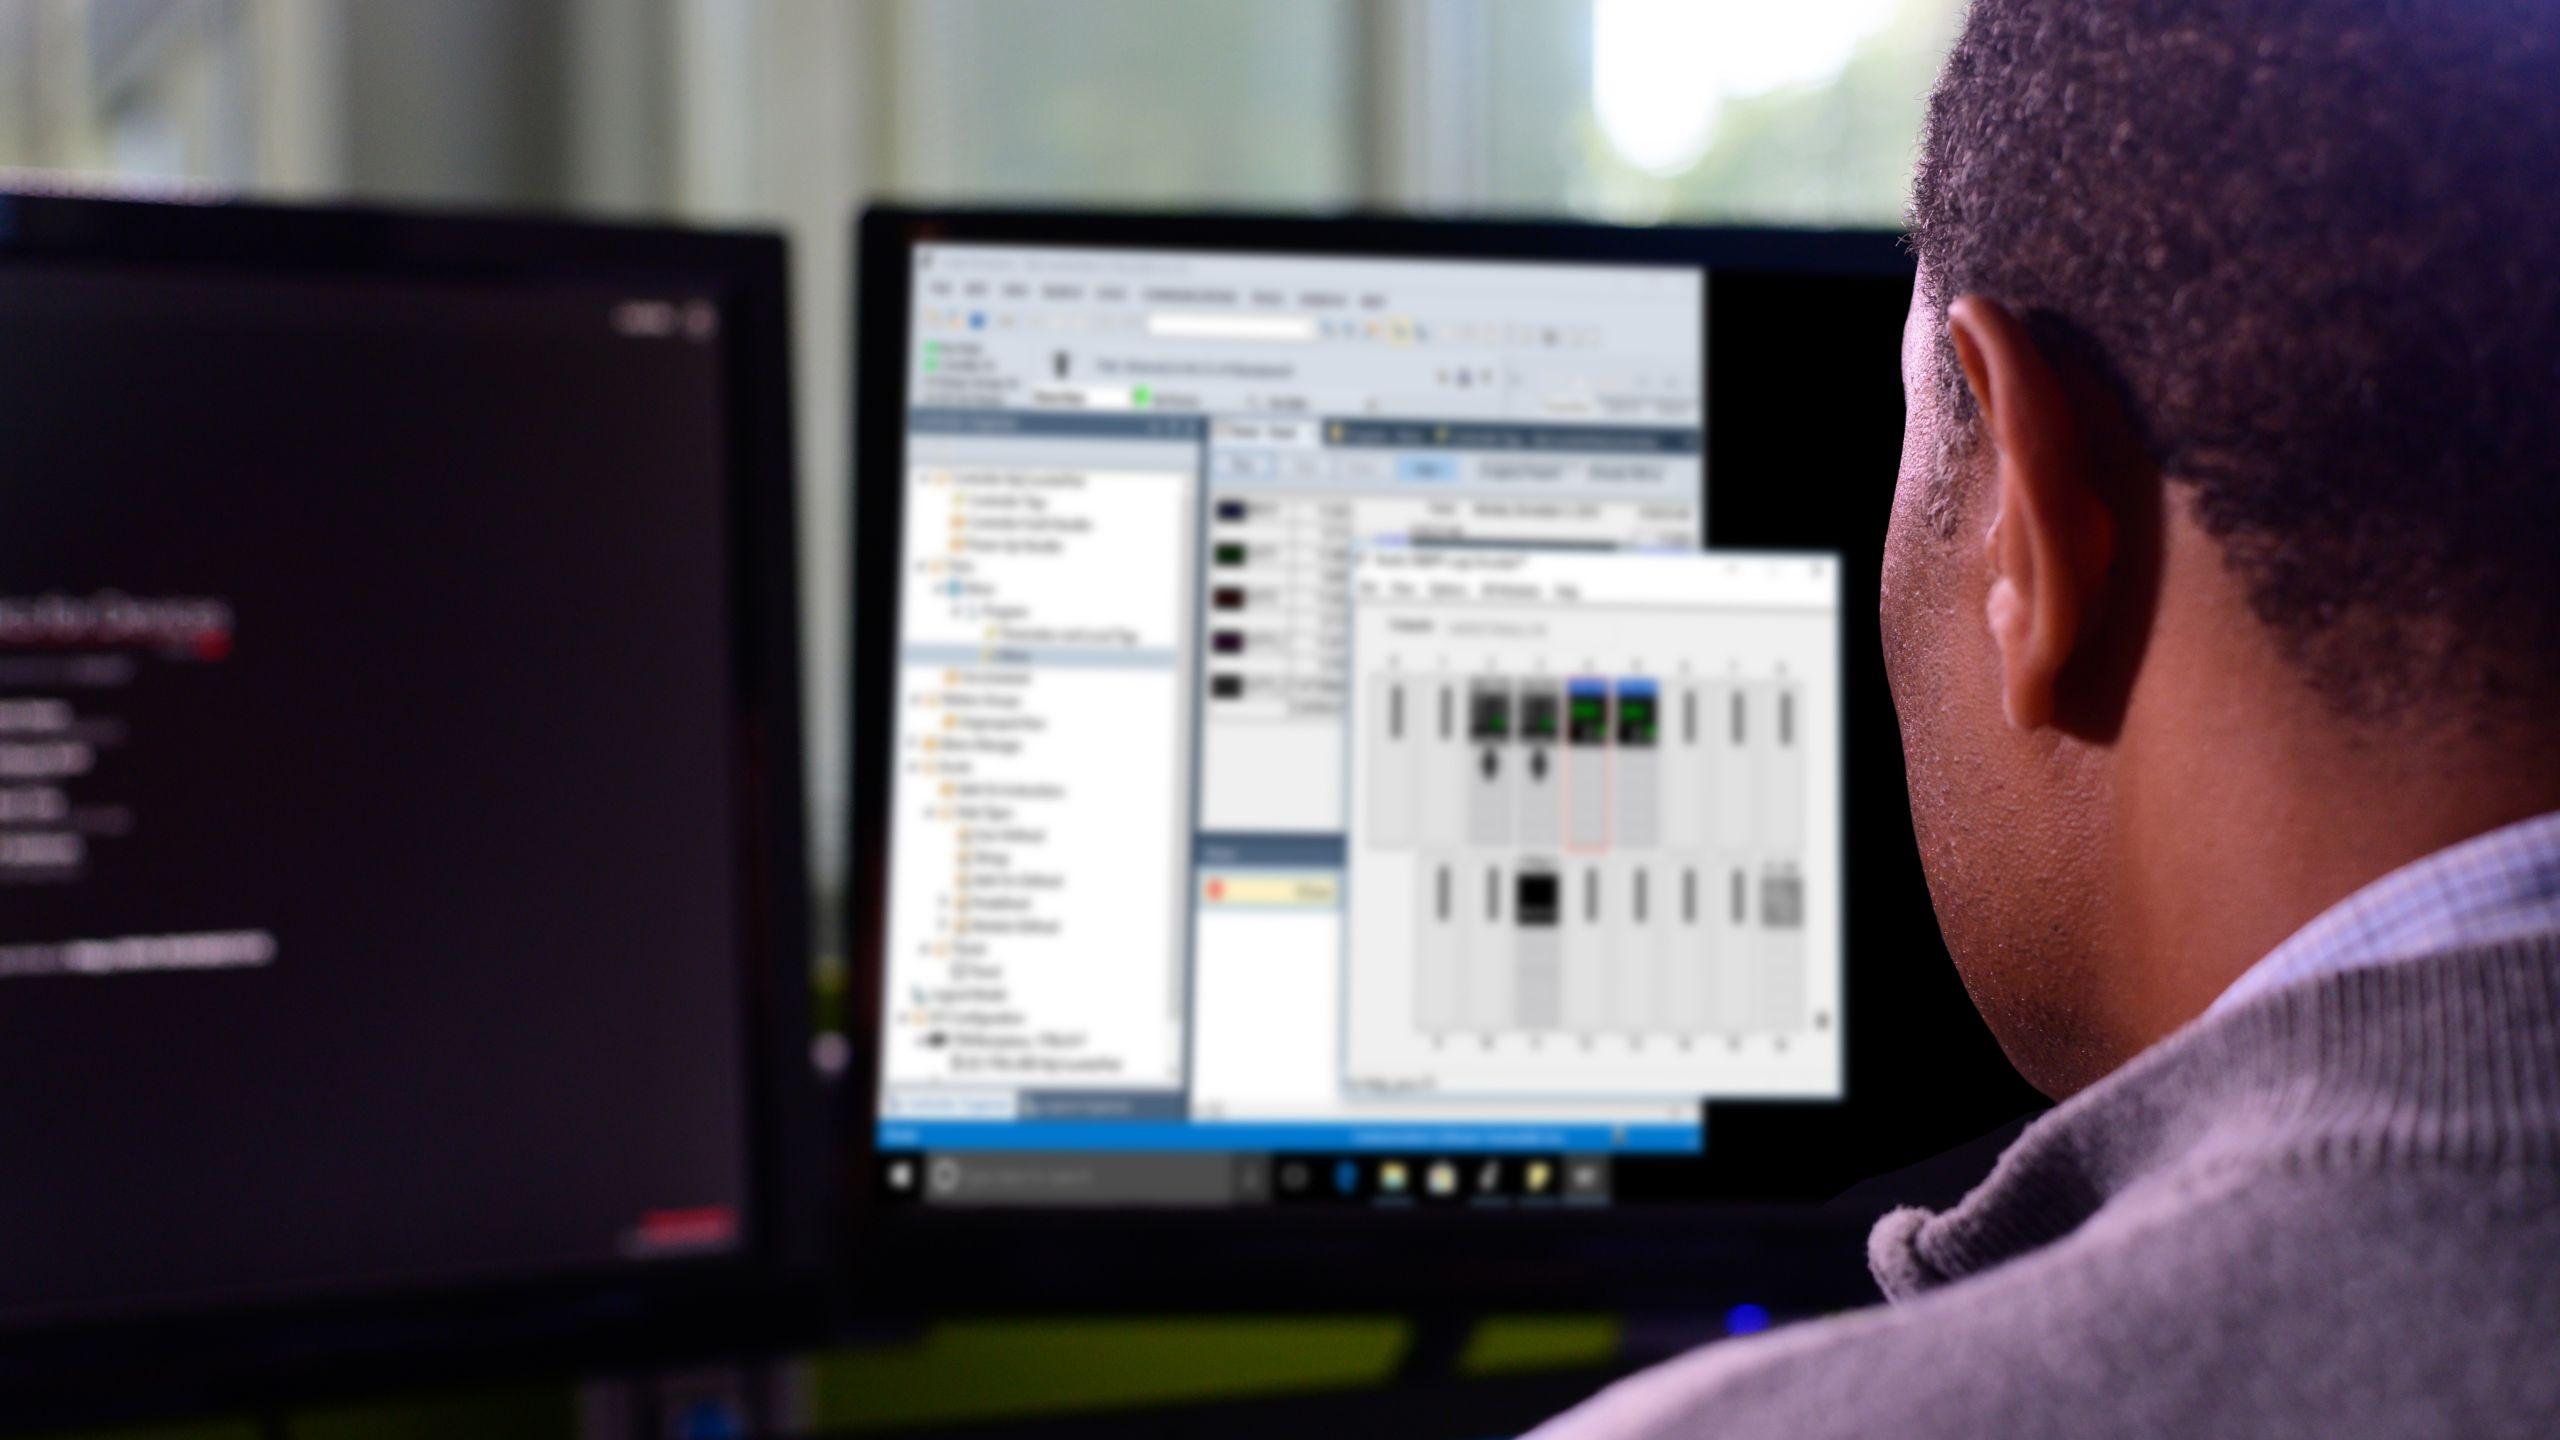 PLC-5 to ControlLogix Migration